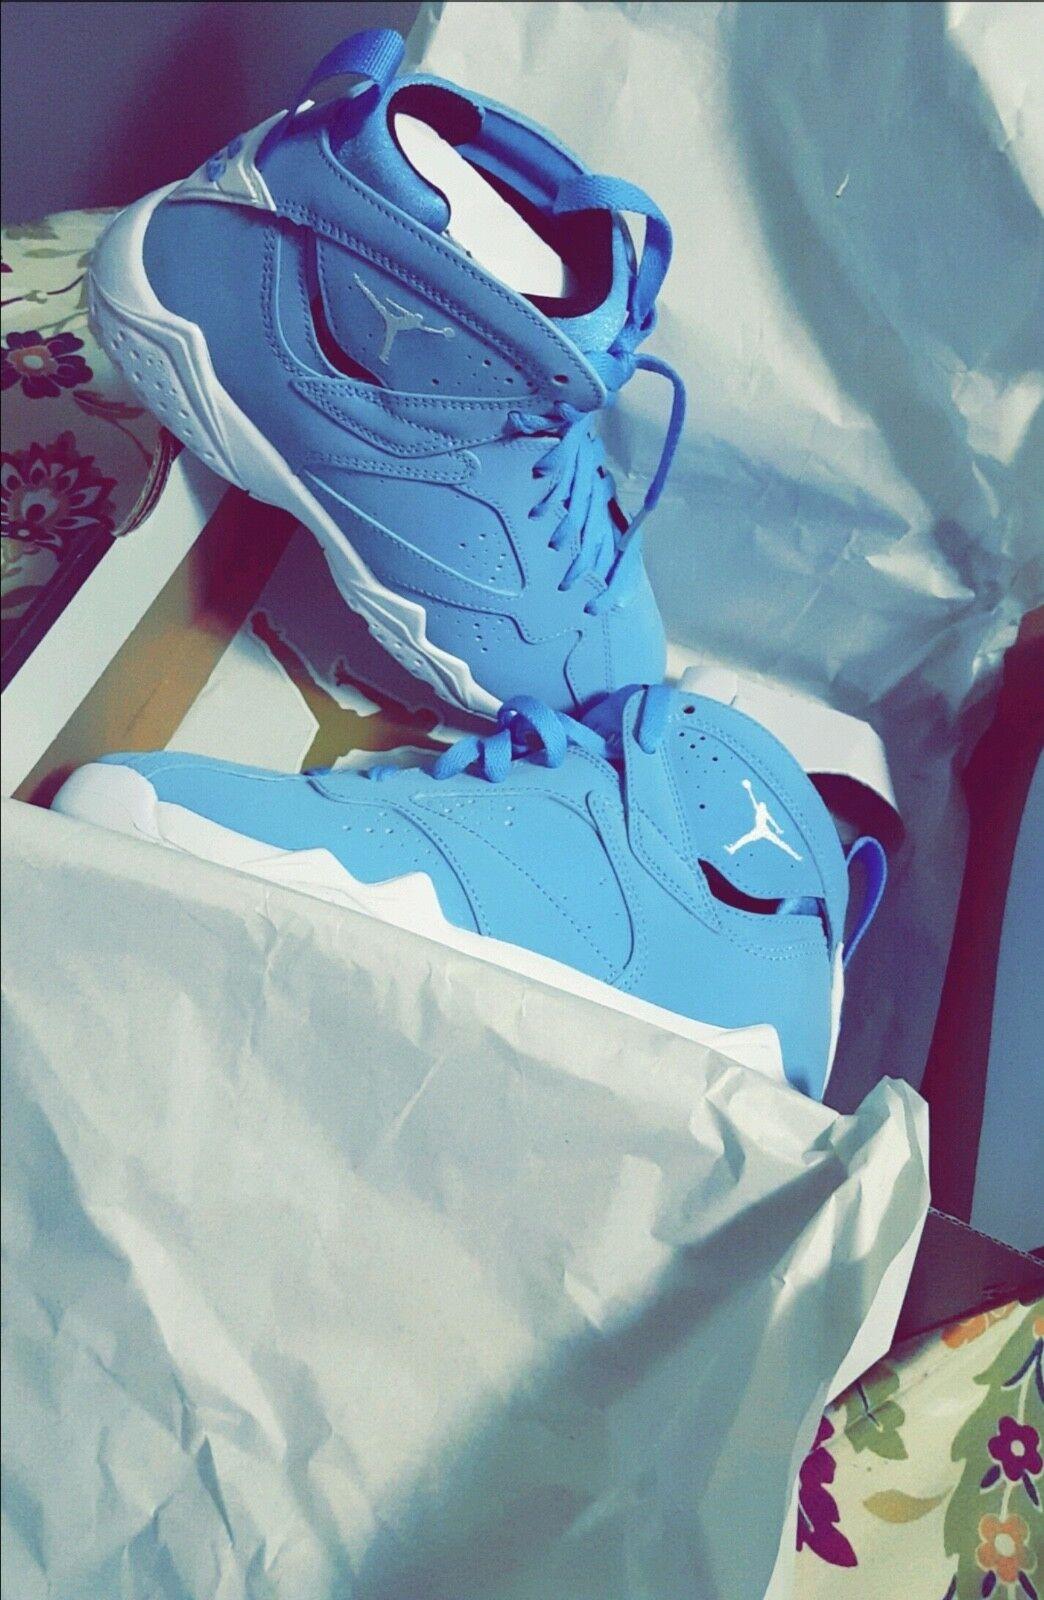 Nike Air Jordan Retro 7 VII Pantone University Blue